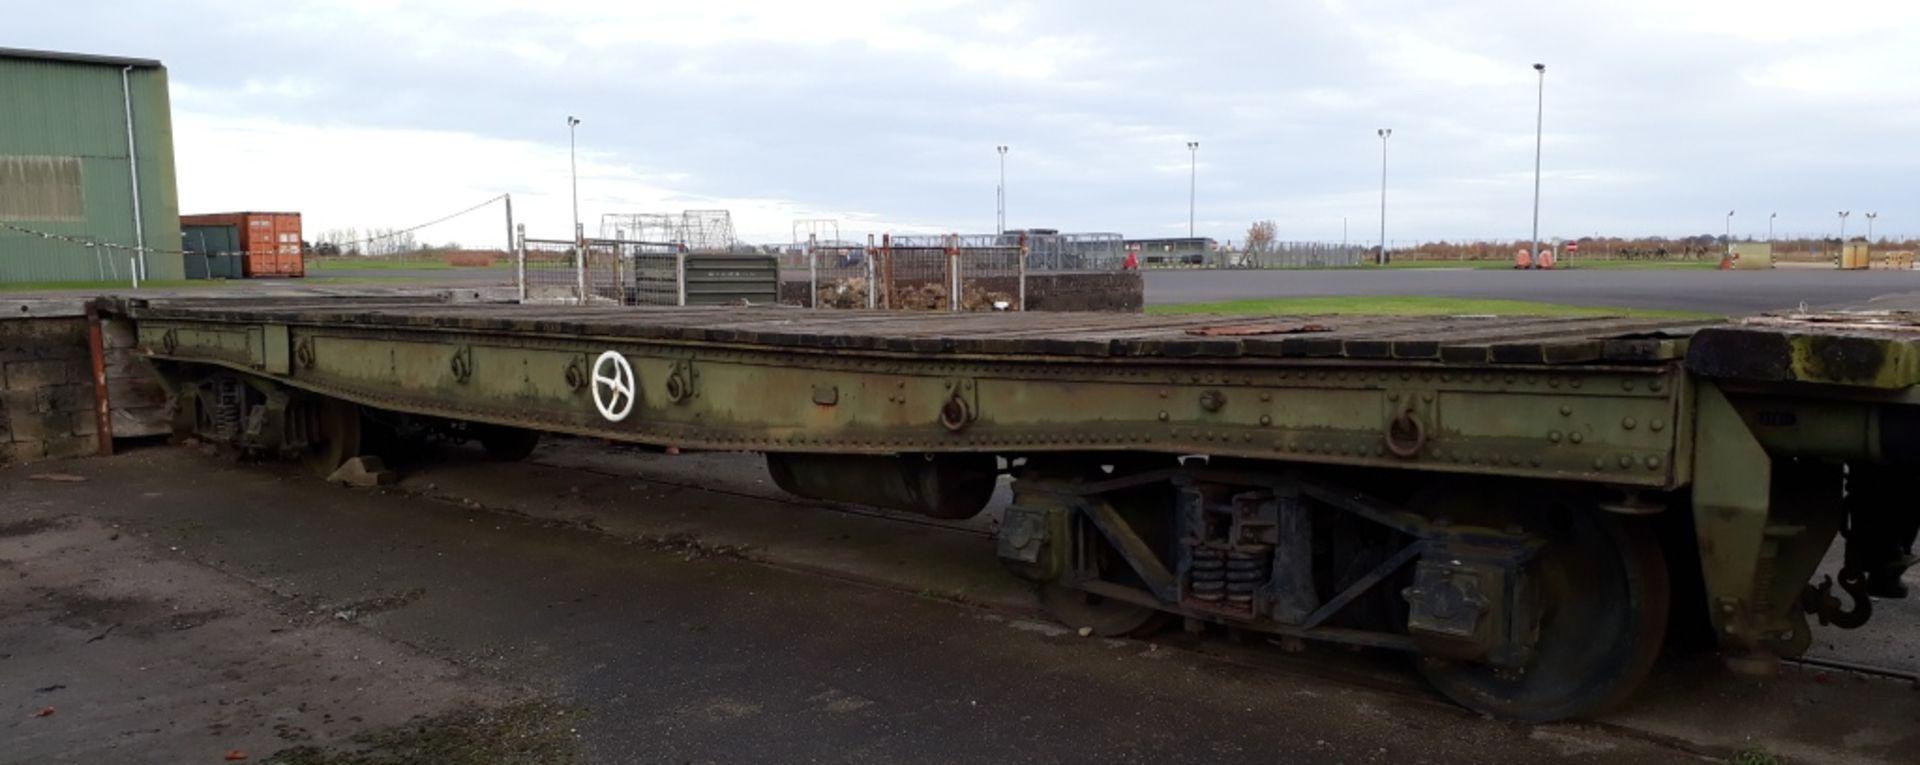 Warflat rail wagon, Built by Metropolitan – Cammell Carriage & Wagon Co Ltd Birmingham 194